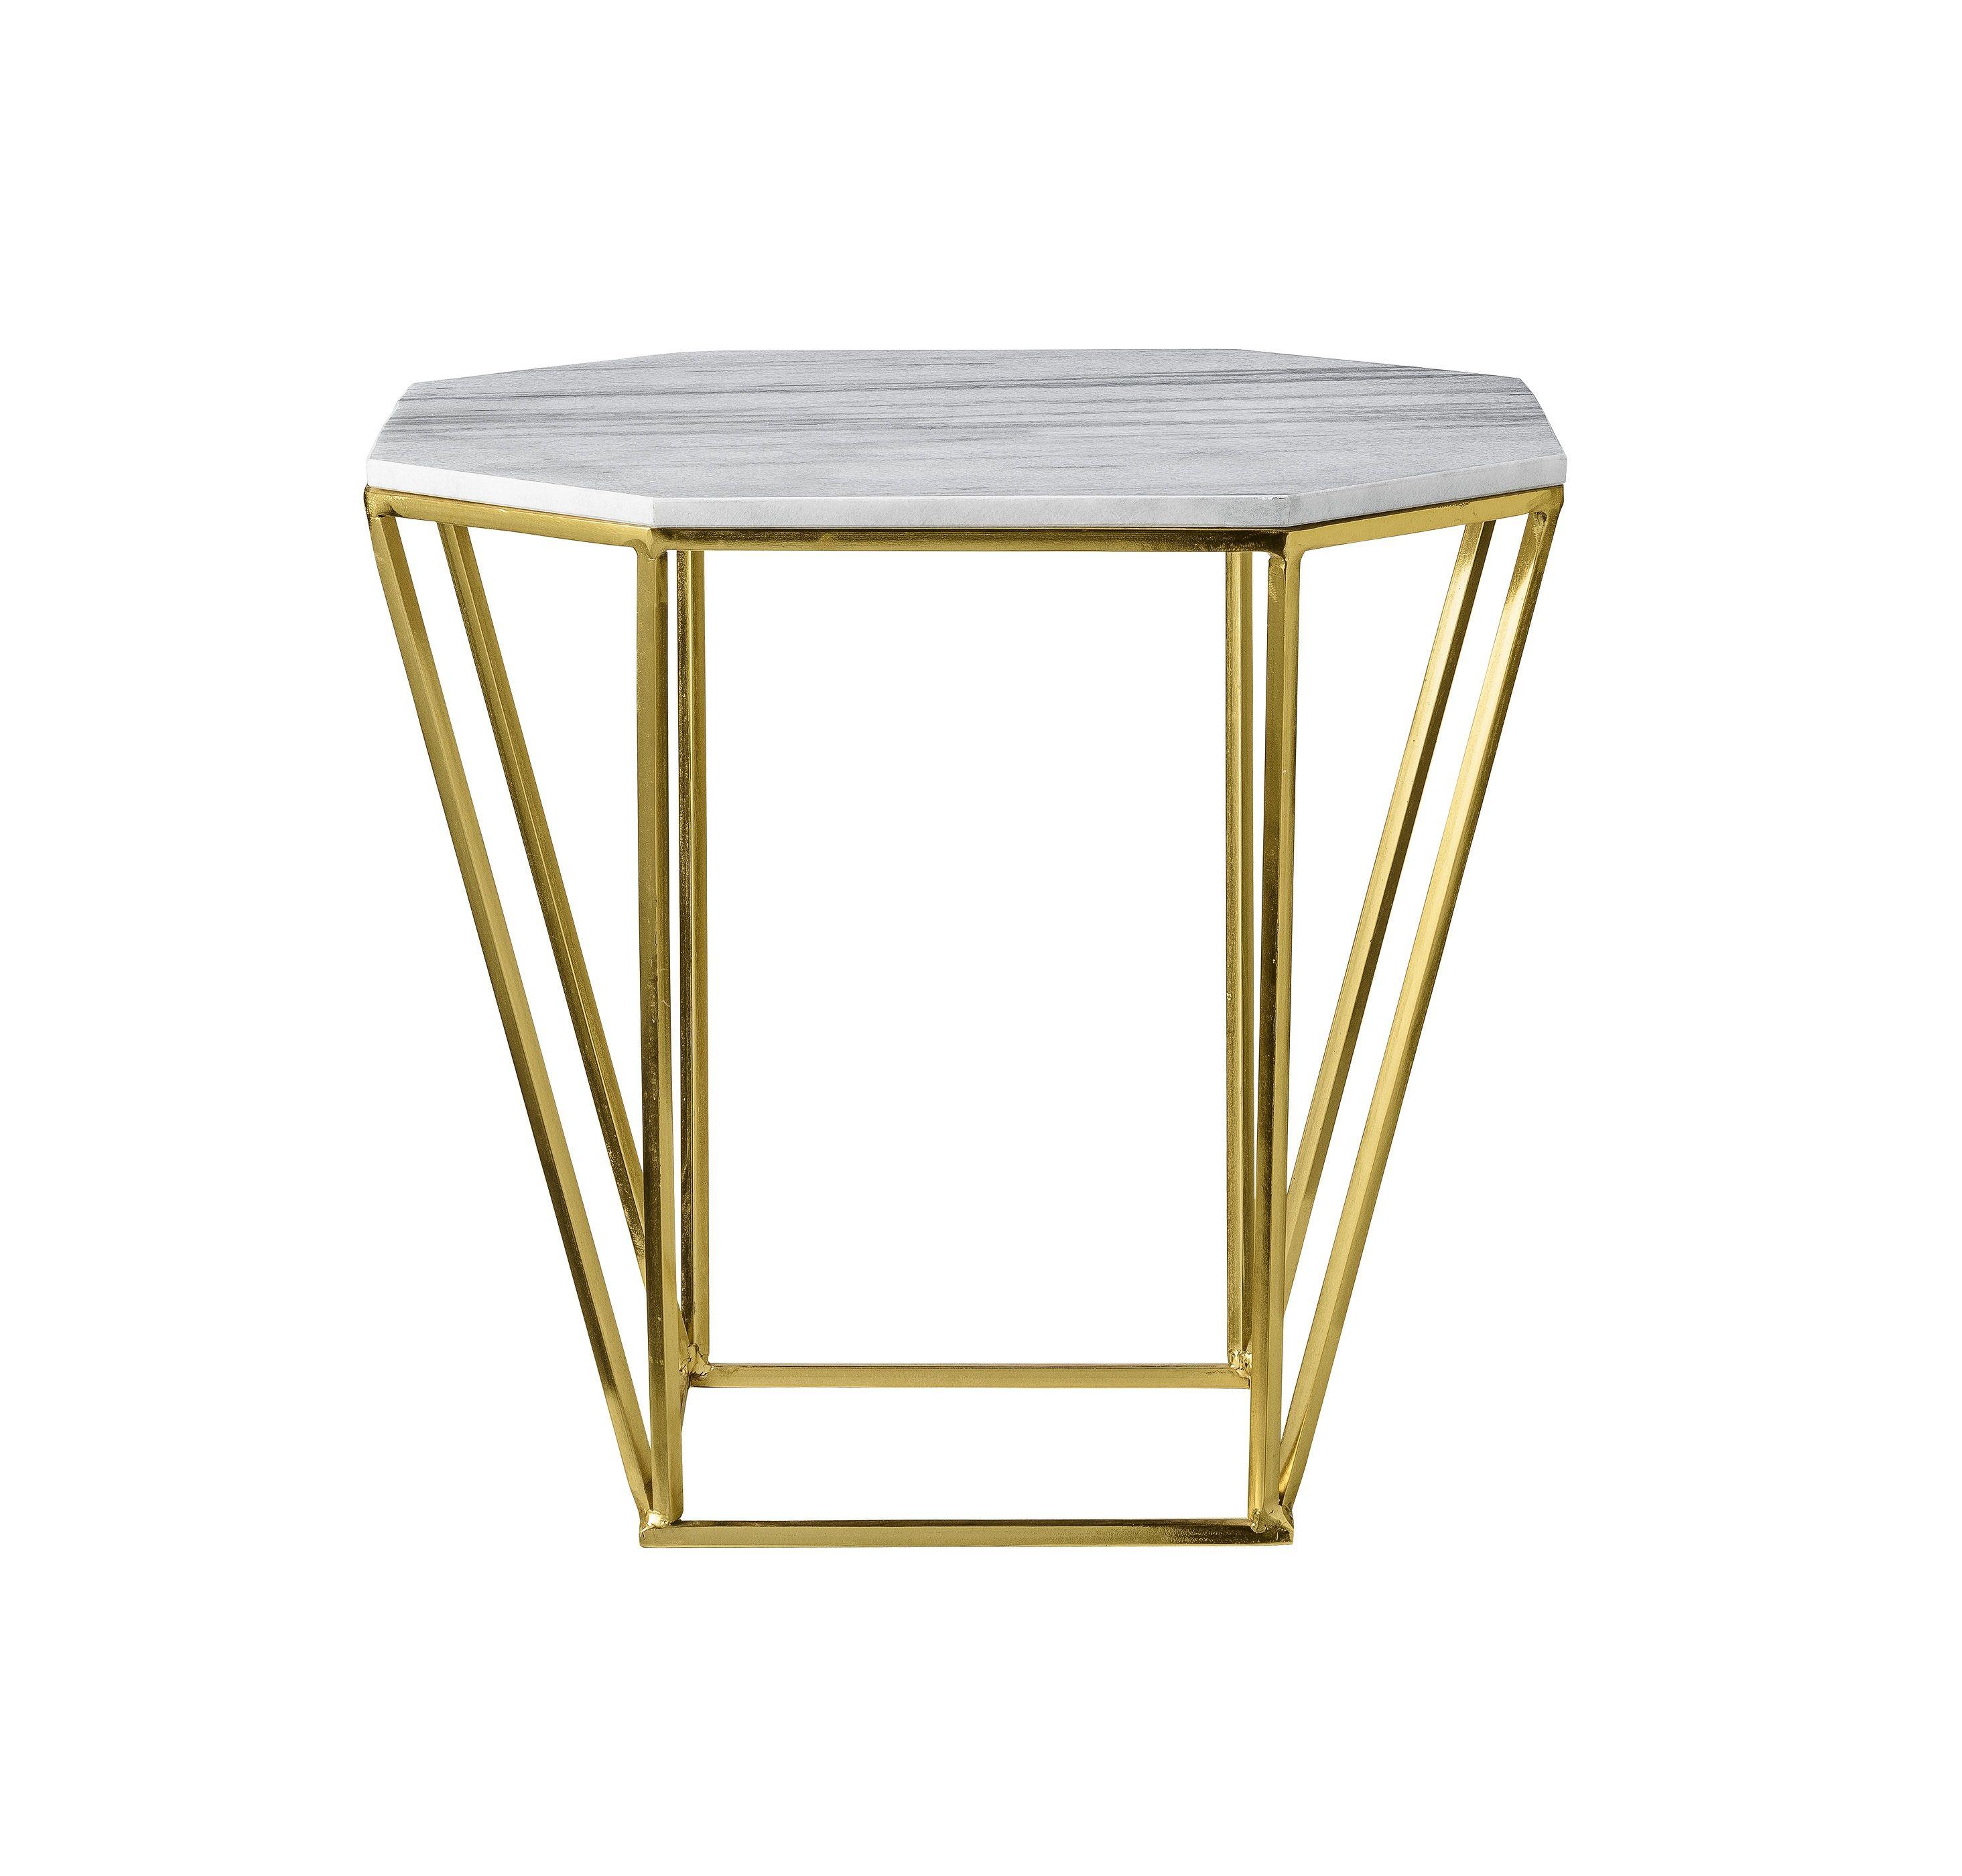 Couchtisch Metric Metall Marmor Gold   My Home Is My Castle ... Marmor Wohnzimmer Tische